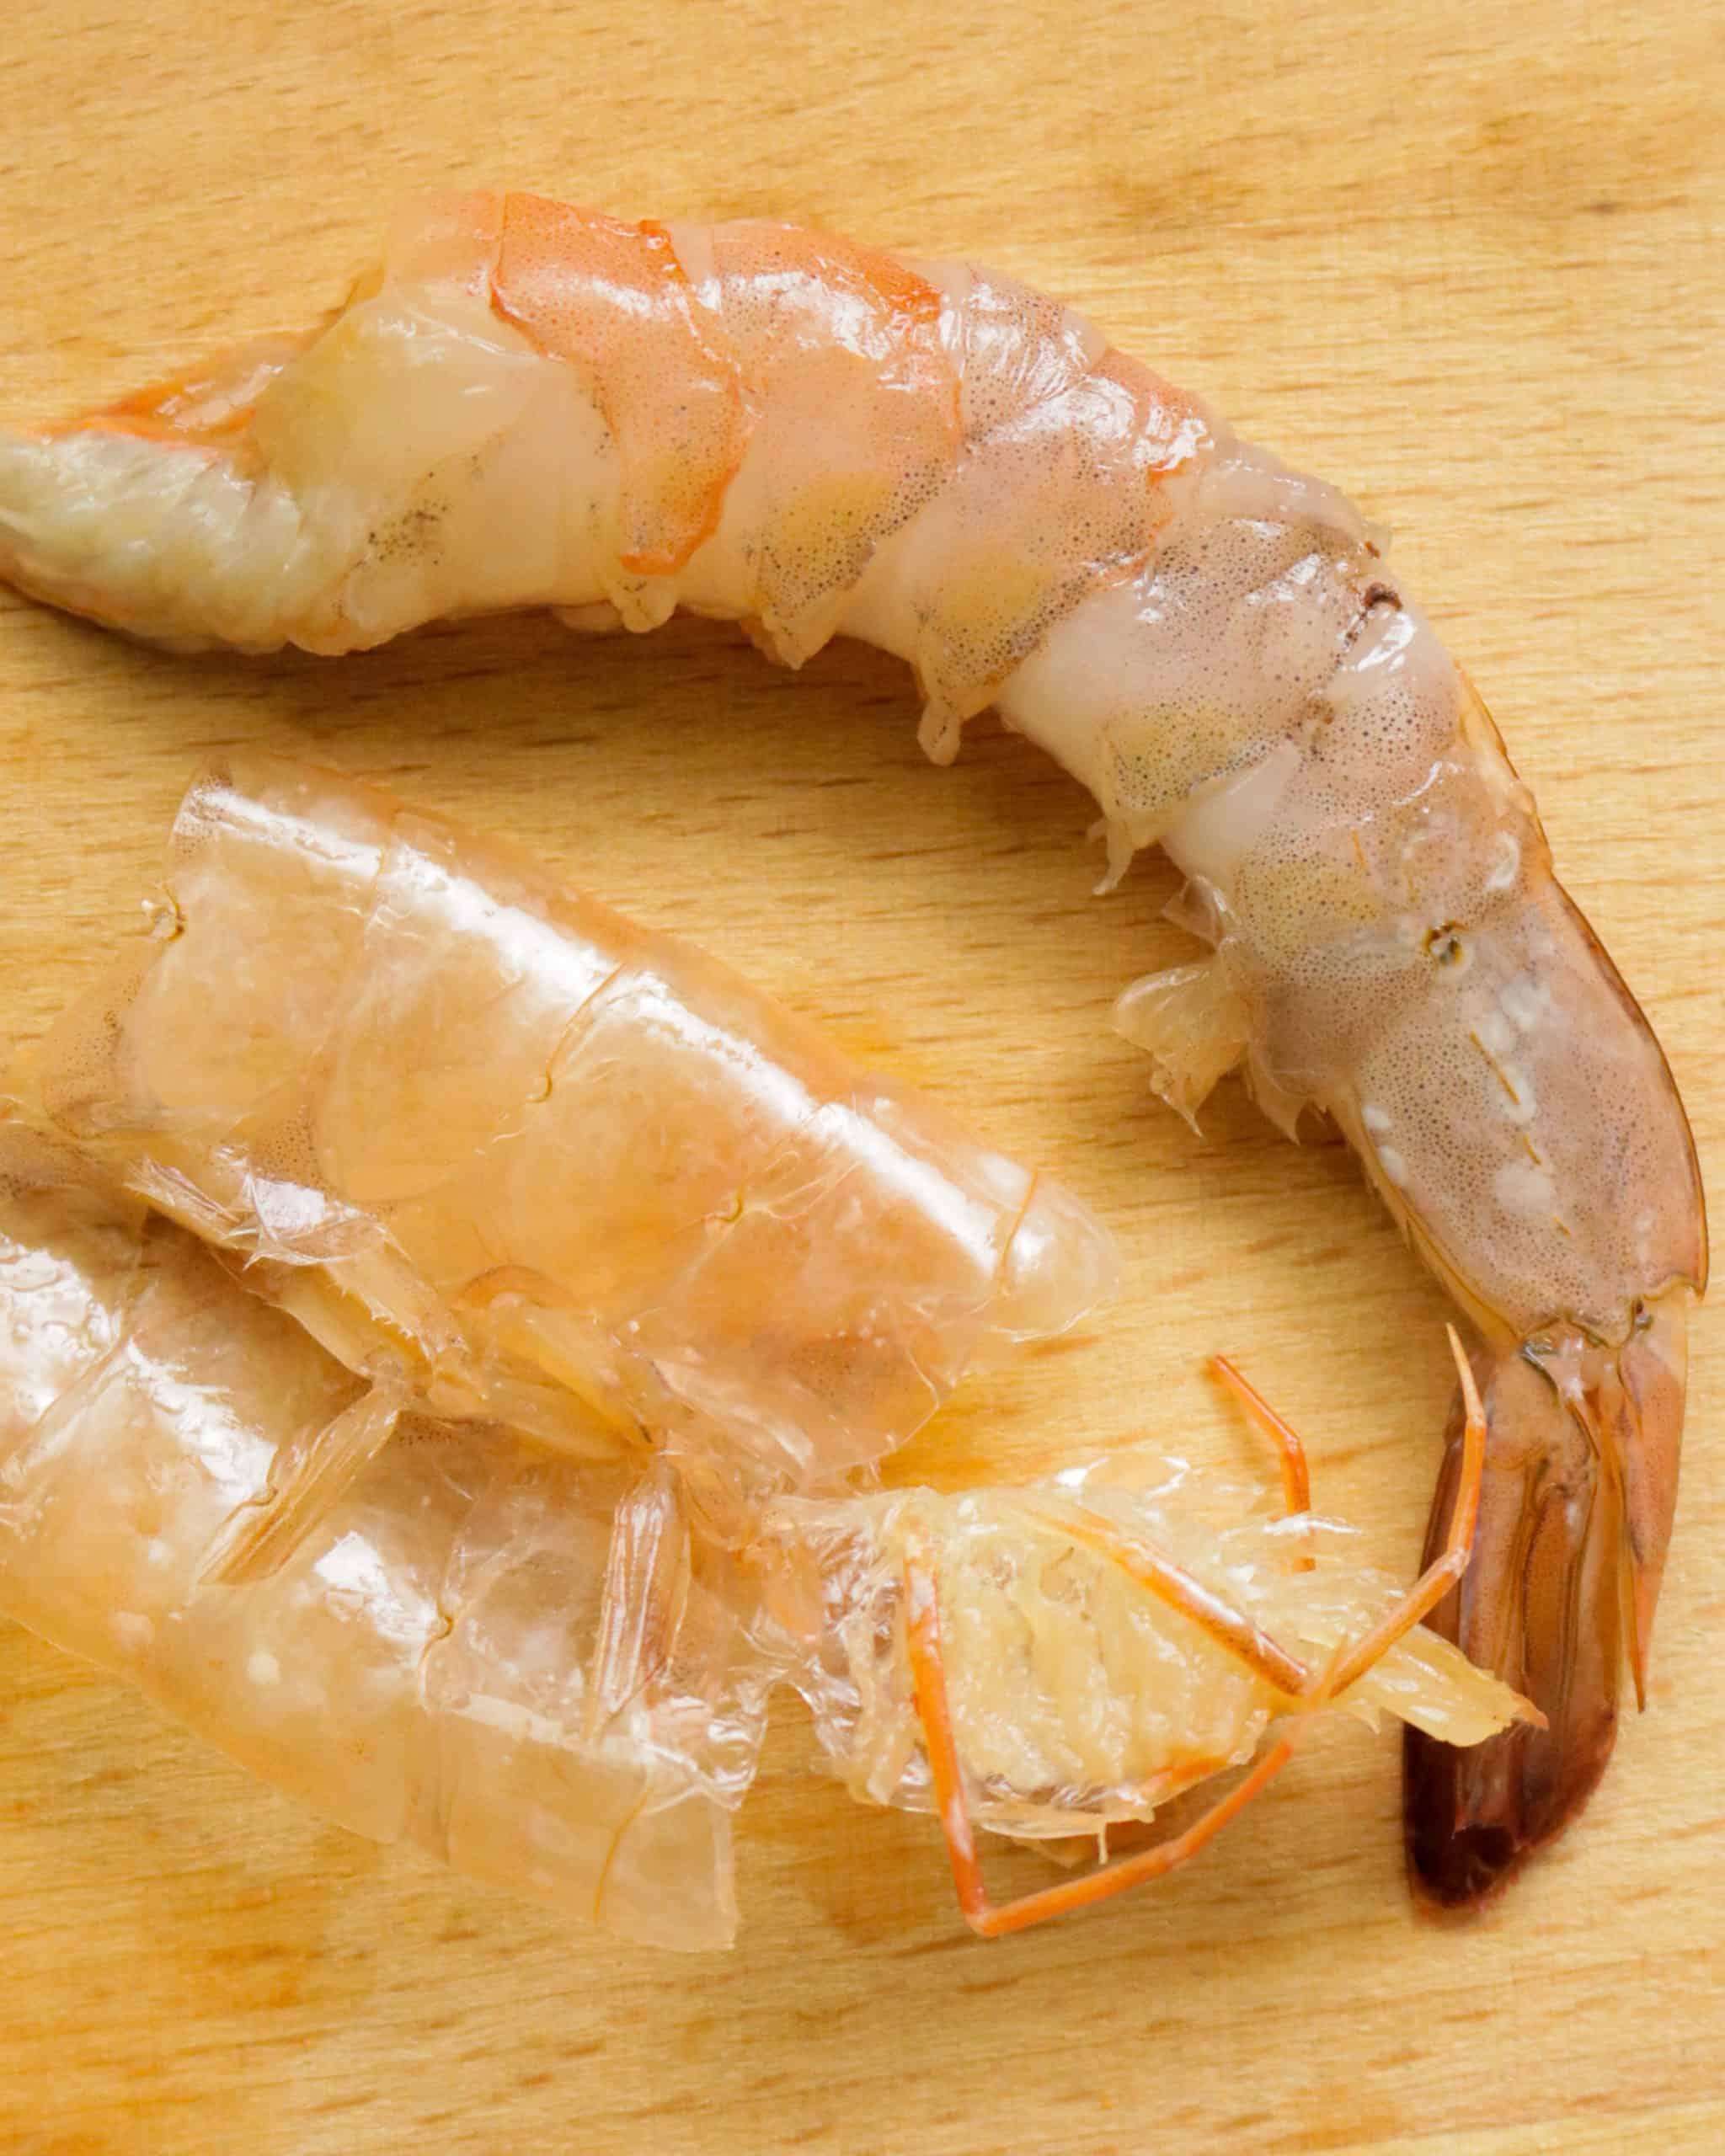 deshelled shrimp to cook